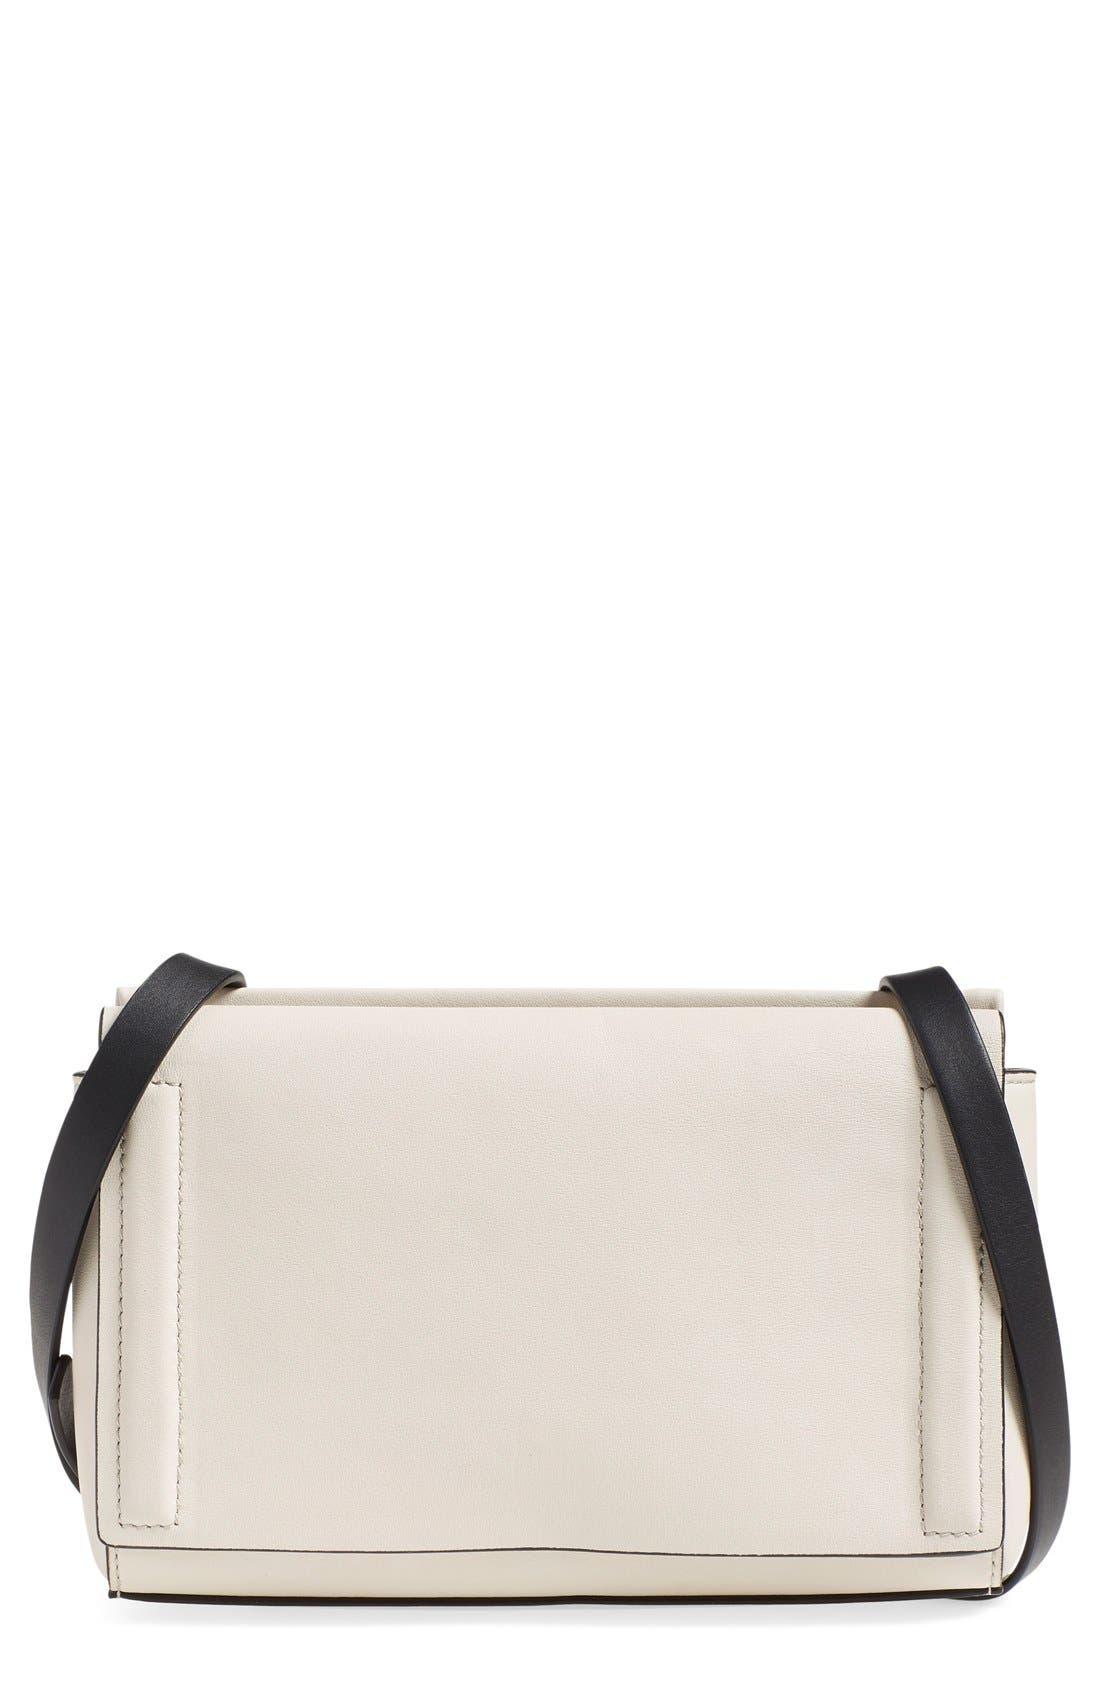 Main Image - rag & bone 'Mini Aston' Leather Crossbody Bag